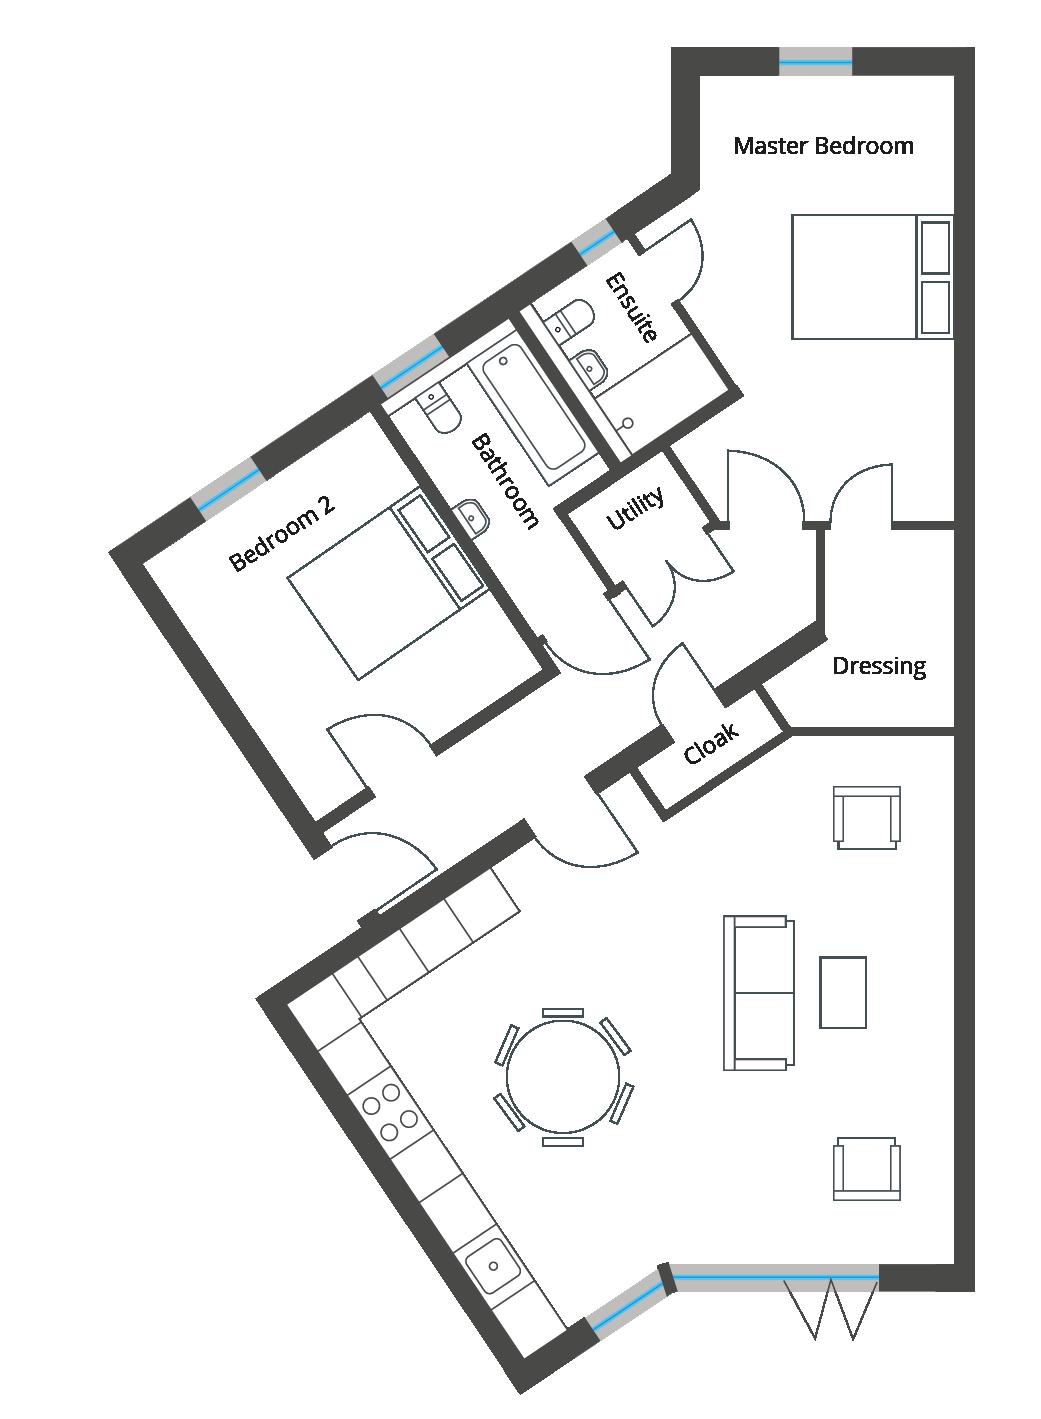 Floorplan for Apartment 6